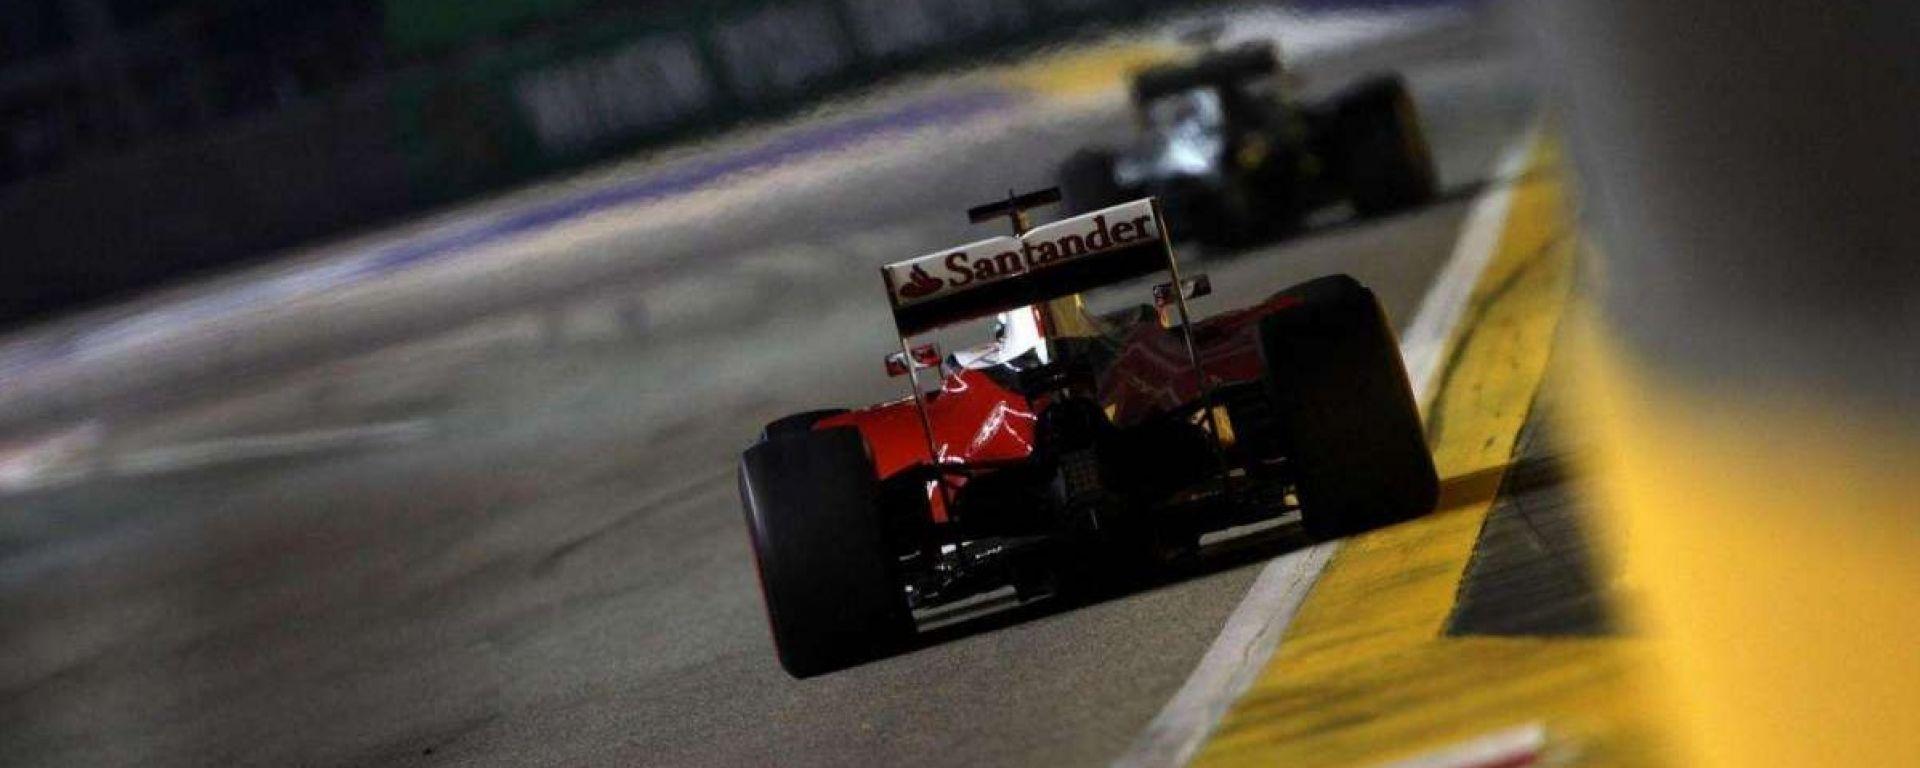 F1 2017 GP Singapore